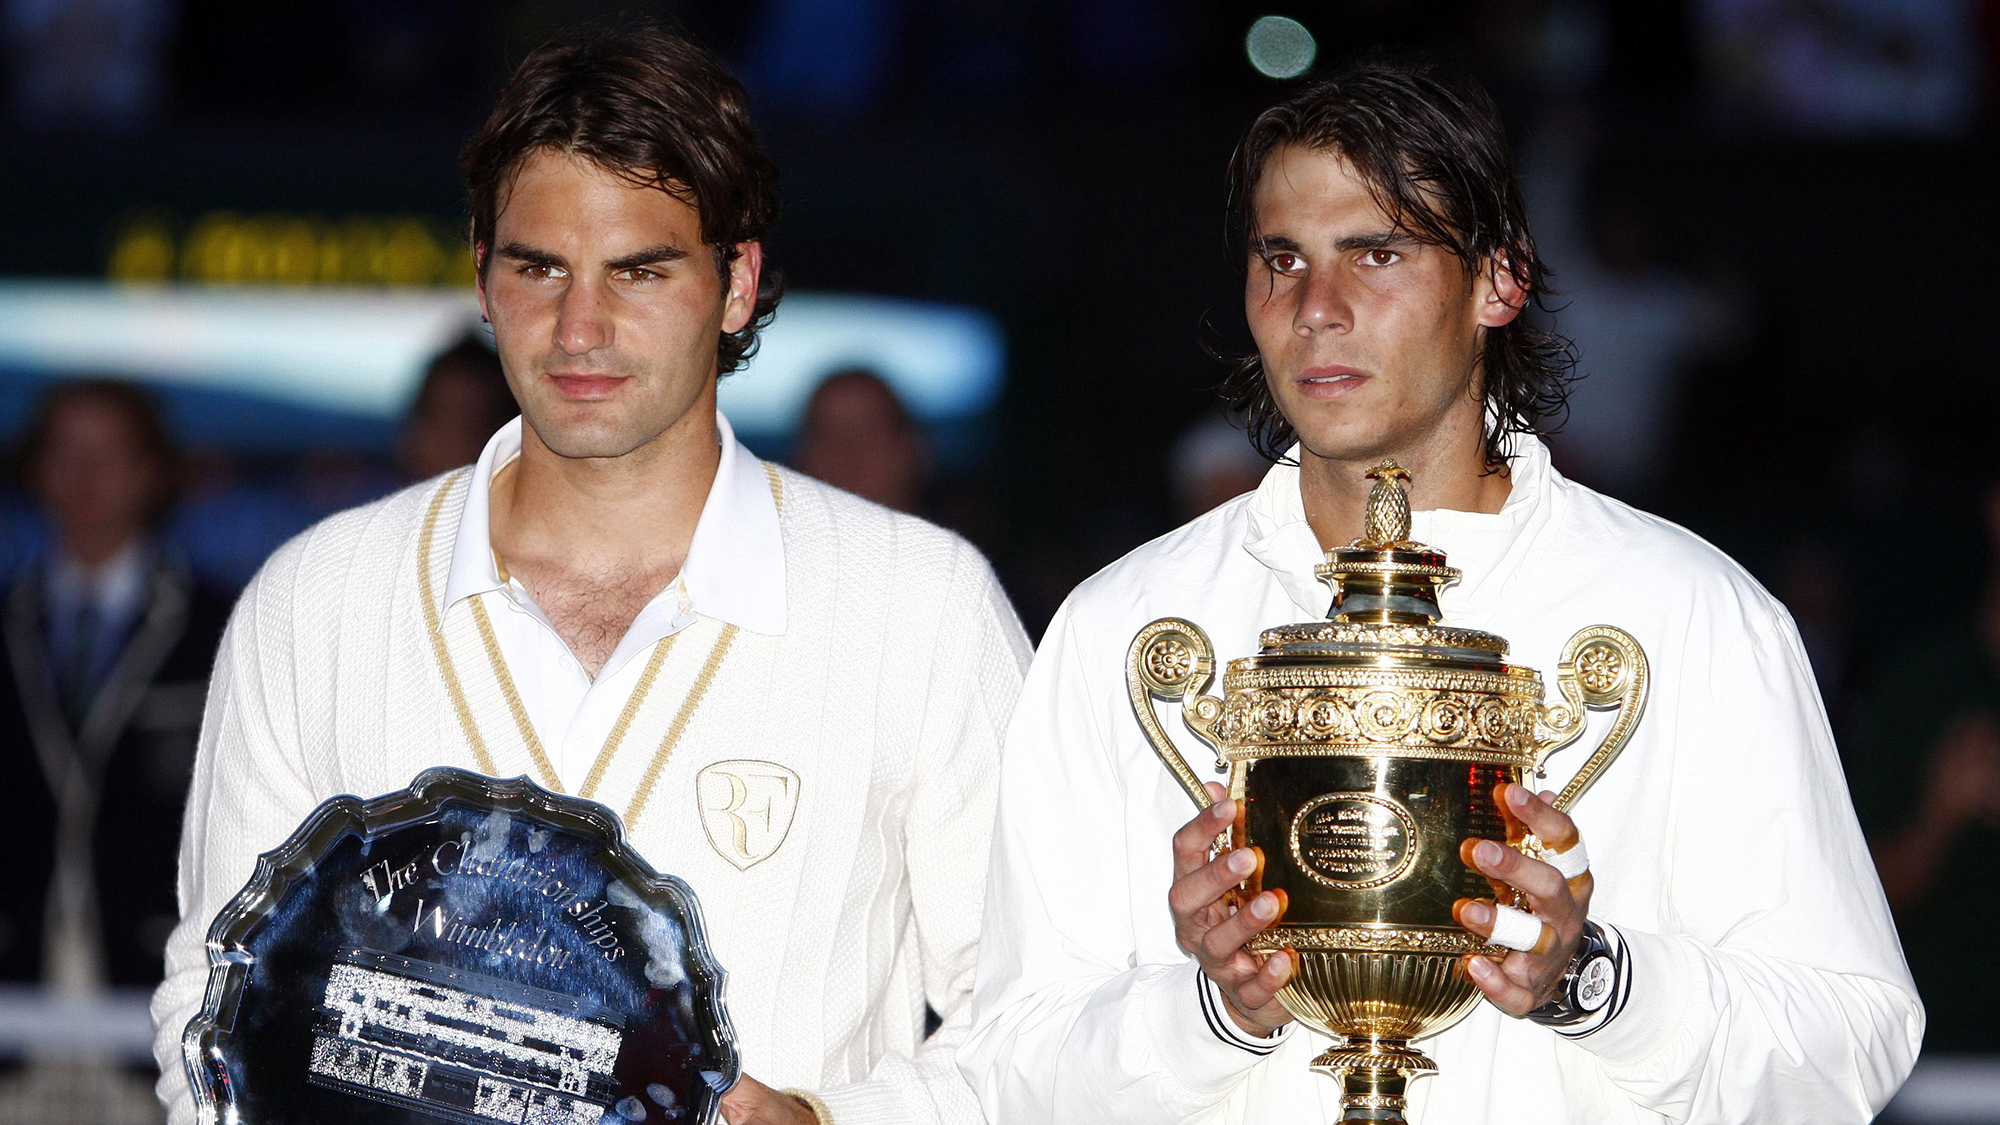 Roger Federer Rafael nadal Strokes of Genius Wimbledon 2008